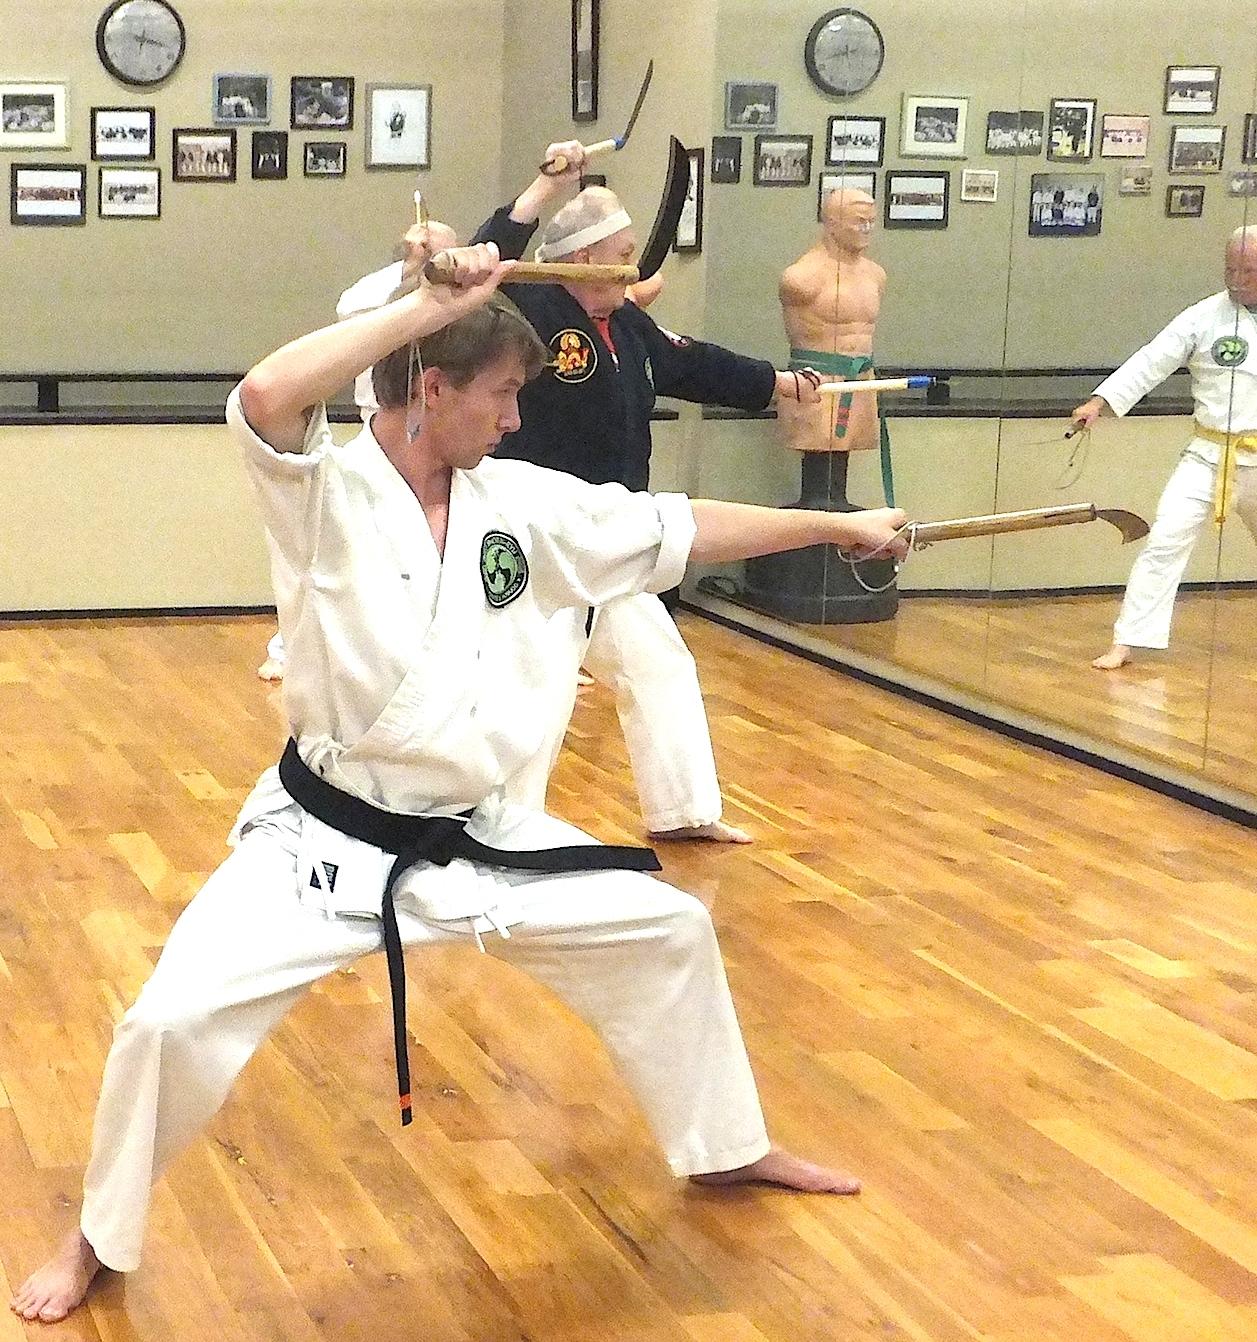 Kama Martial Arts Weapon Kobudo Of Okinawa Arizona A Guide By Soke Hausel Okinawan Kobudo Weapons Training In Mesa Arizona For Martial Artists Gardeners